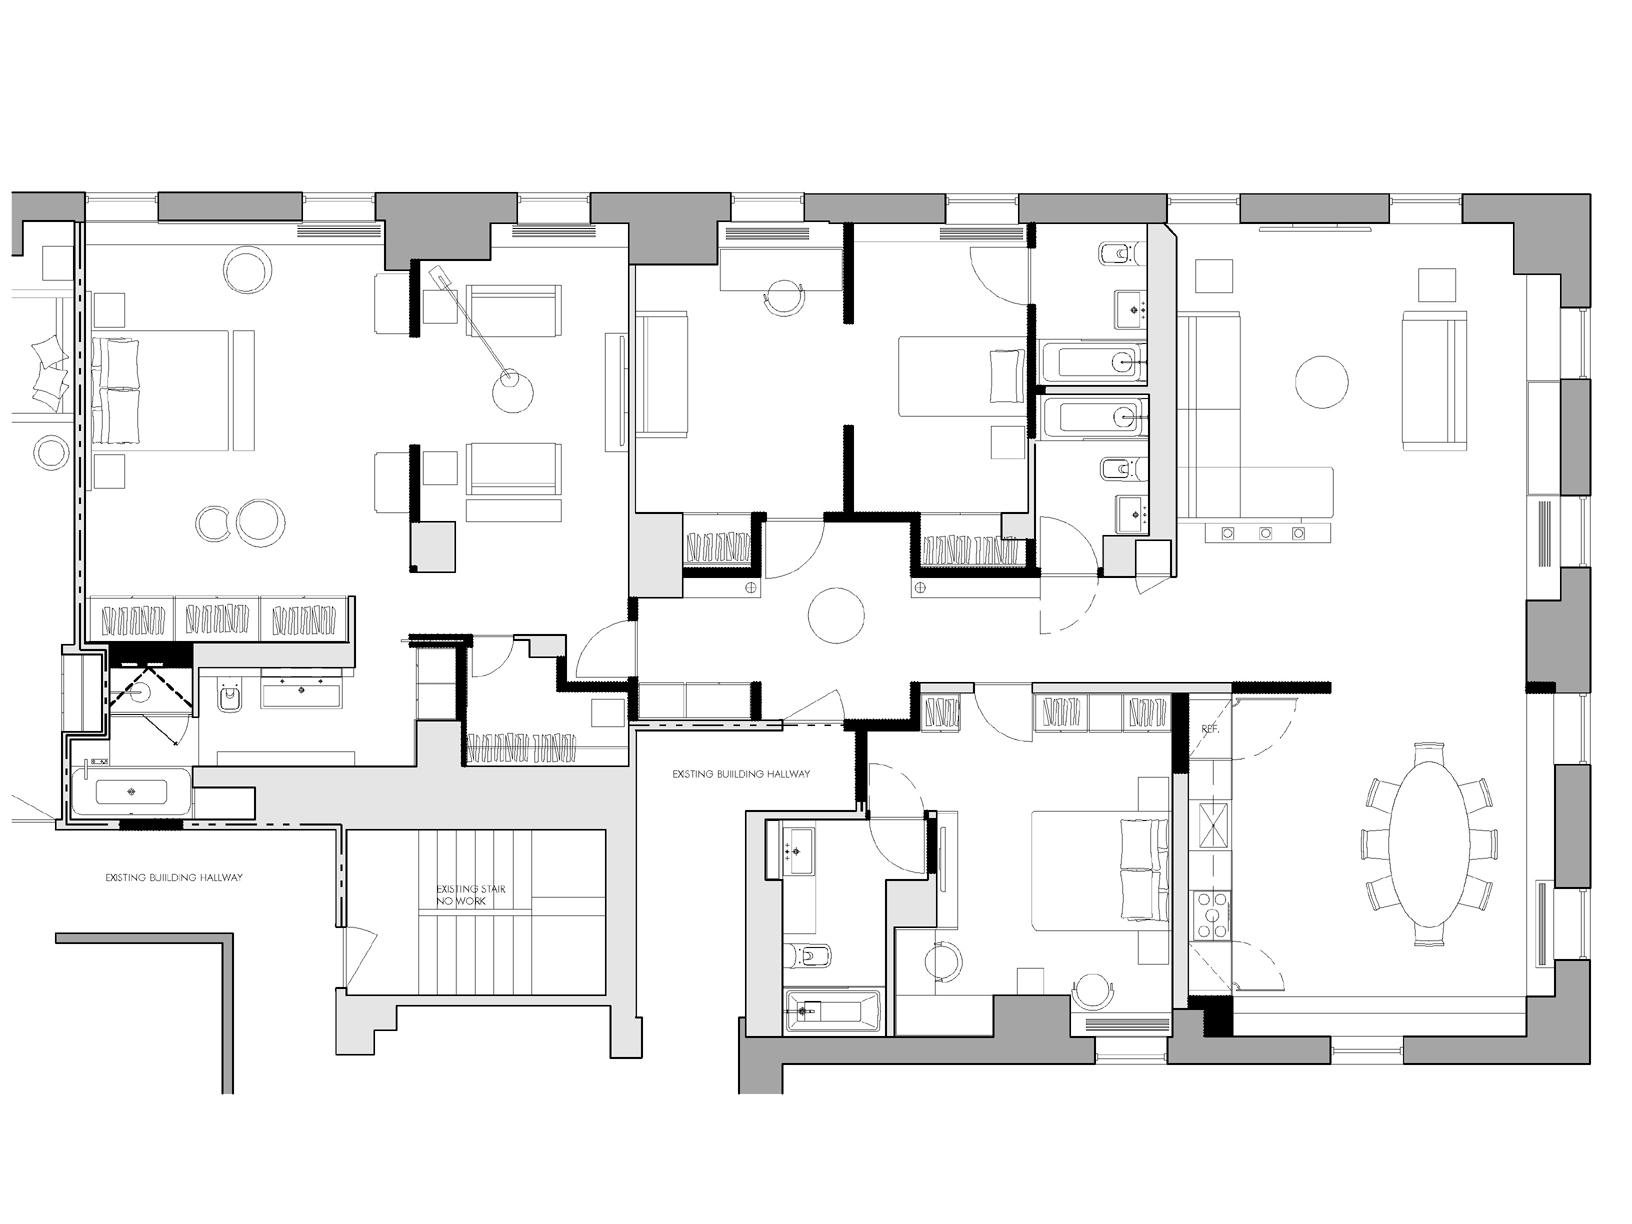 Michelangelo Hotel Residence - 1